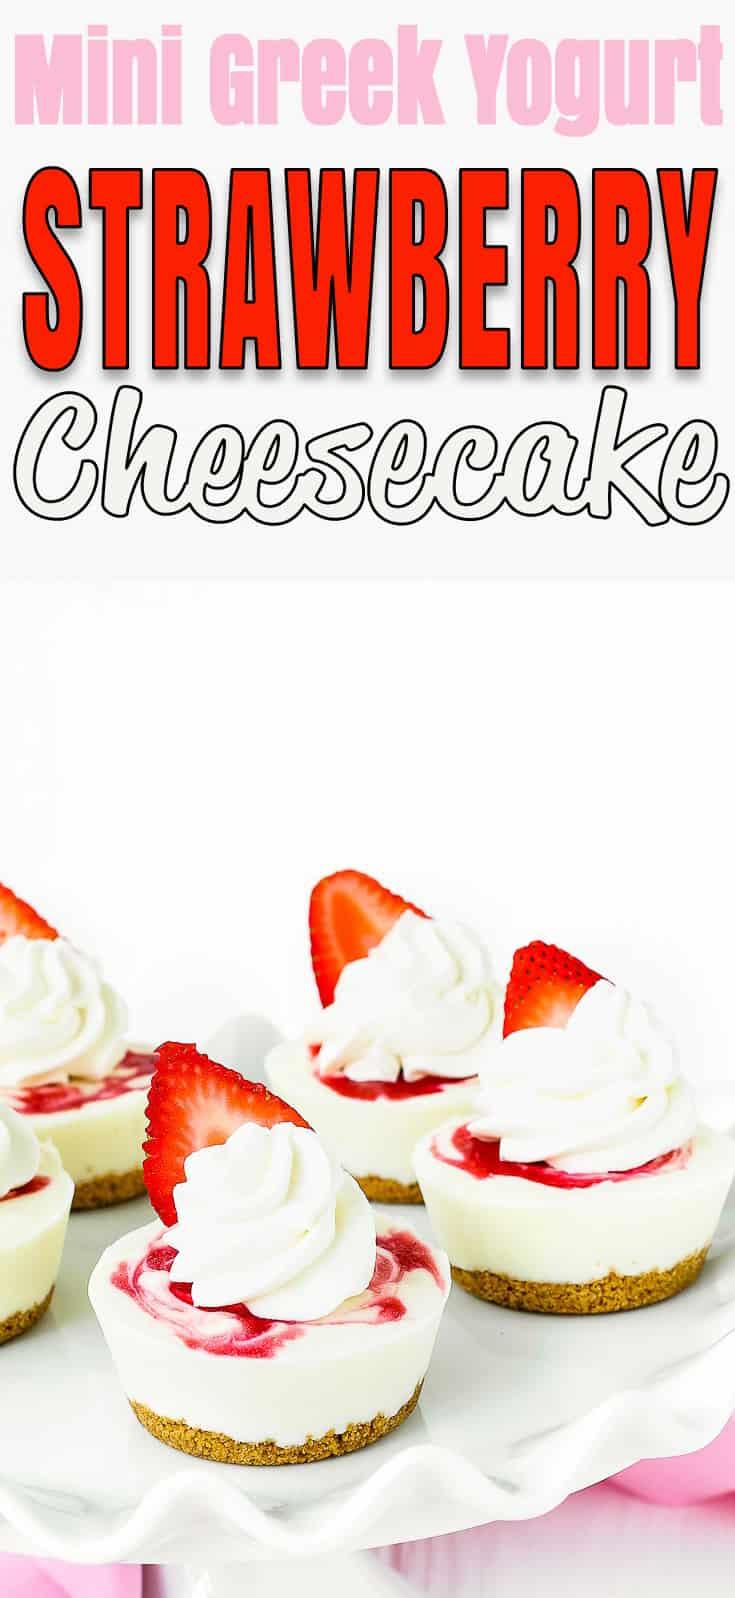 No-Bake Mini Greek Yogurt Strawberry Cheesecake - #recipe #cheesecake #nobake #dessert #summer #strawberry